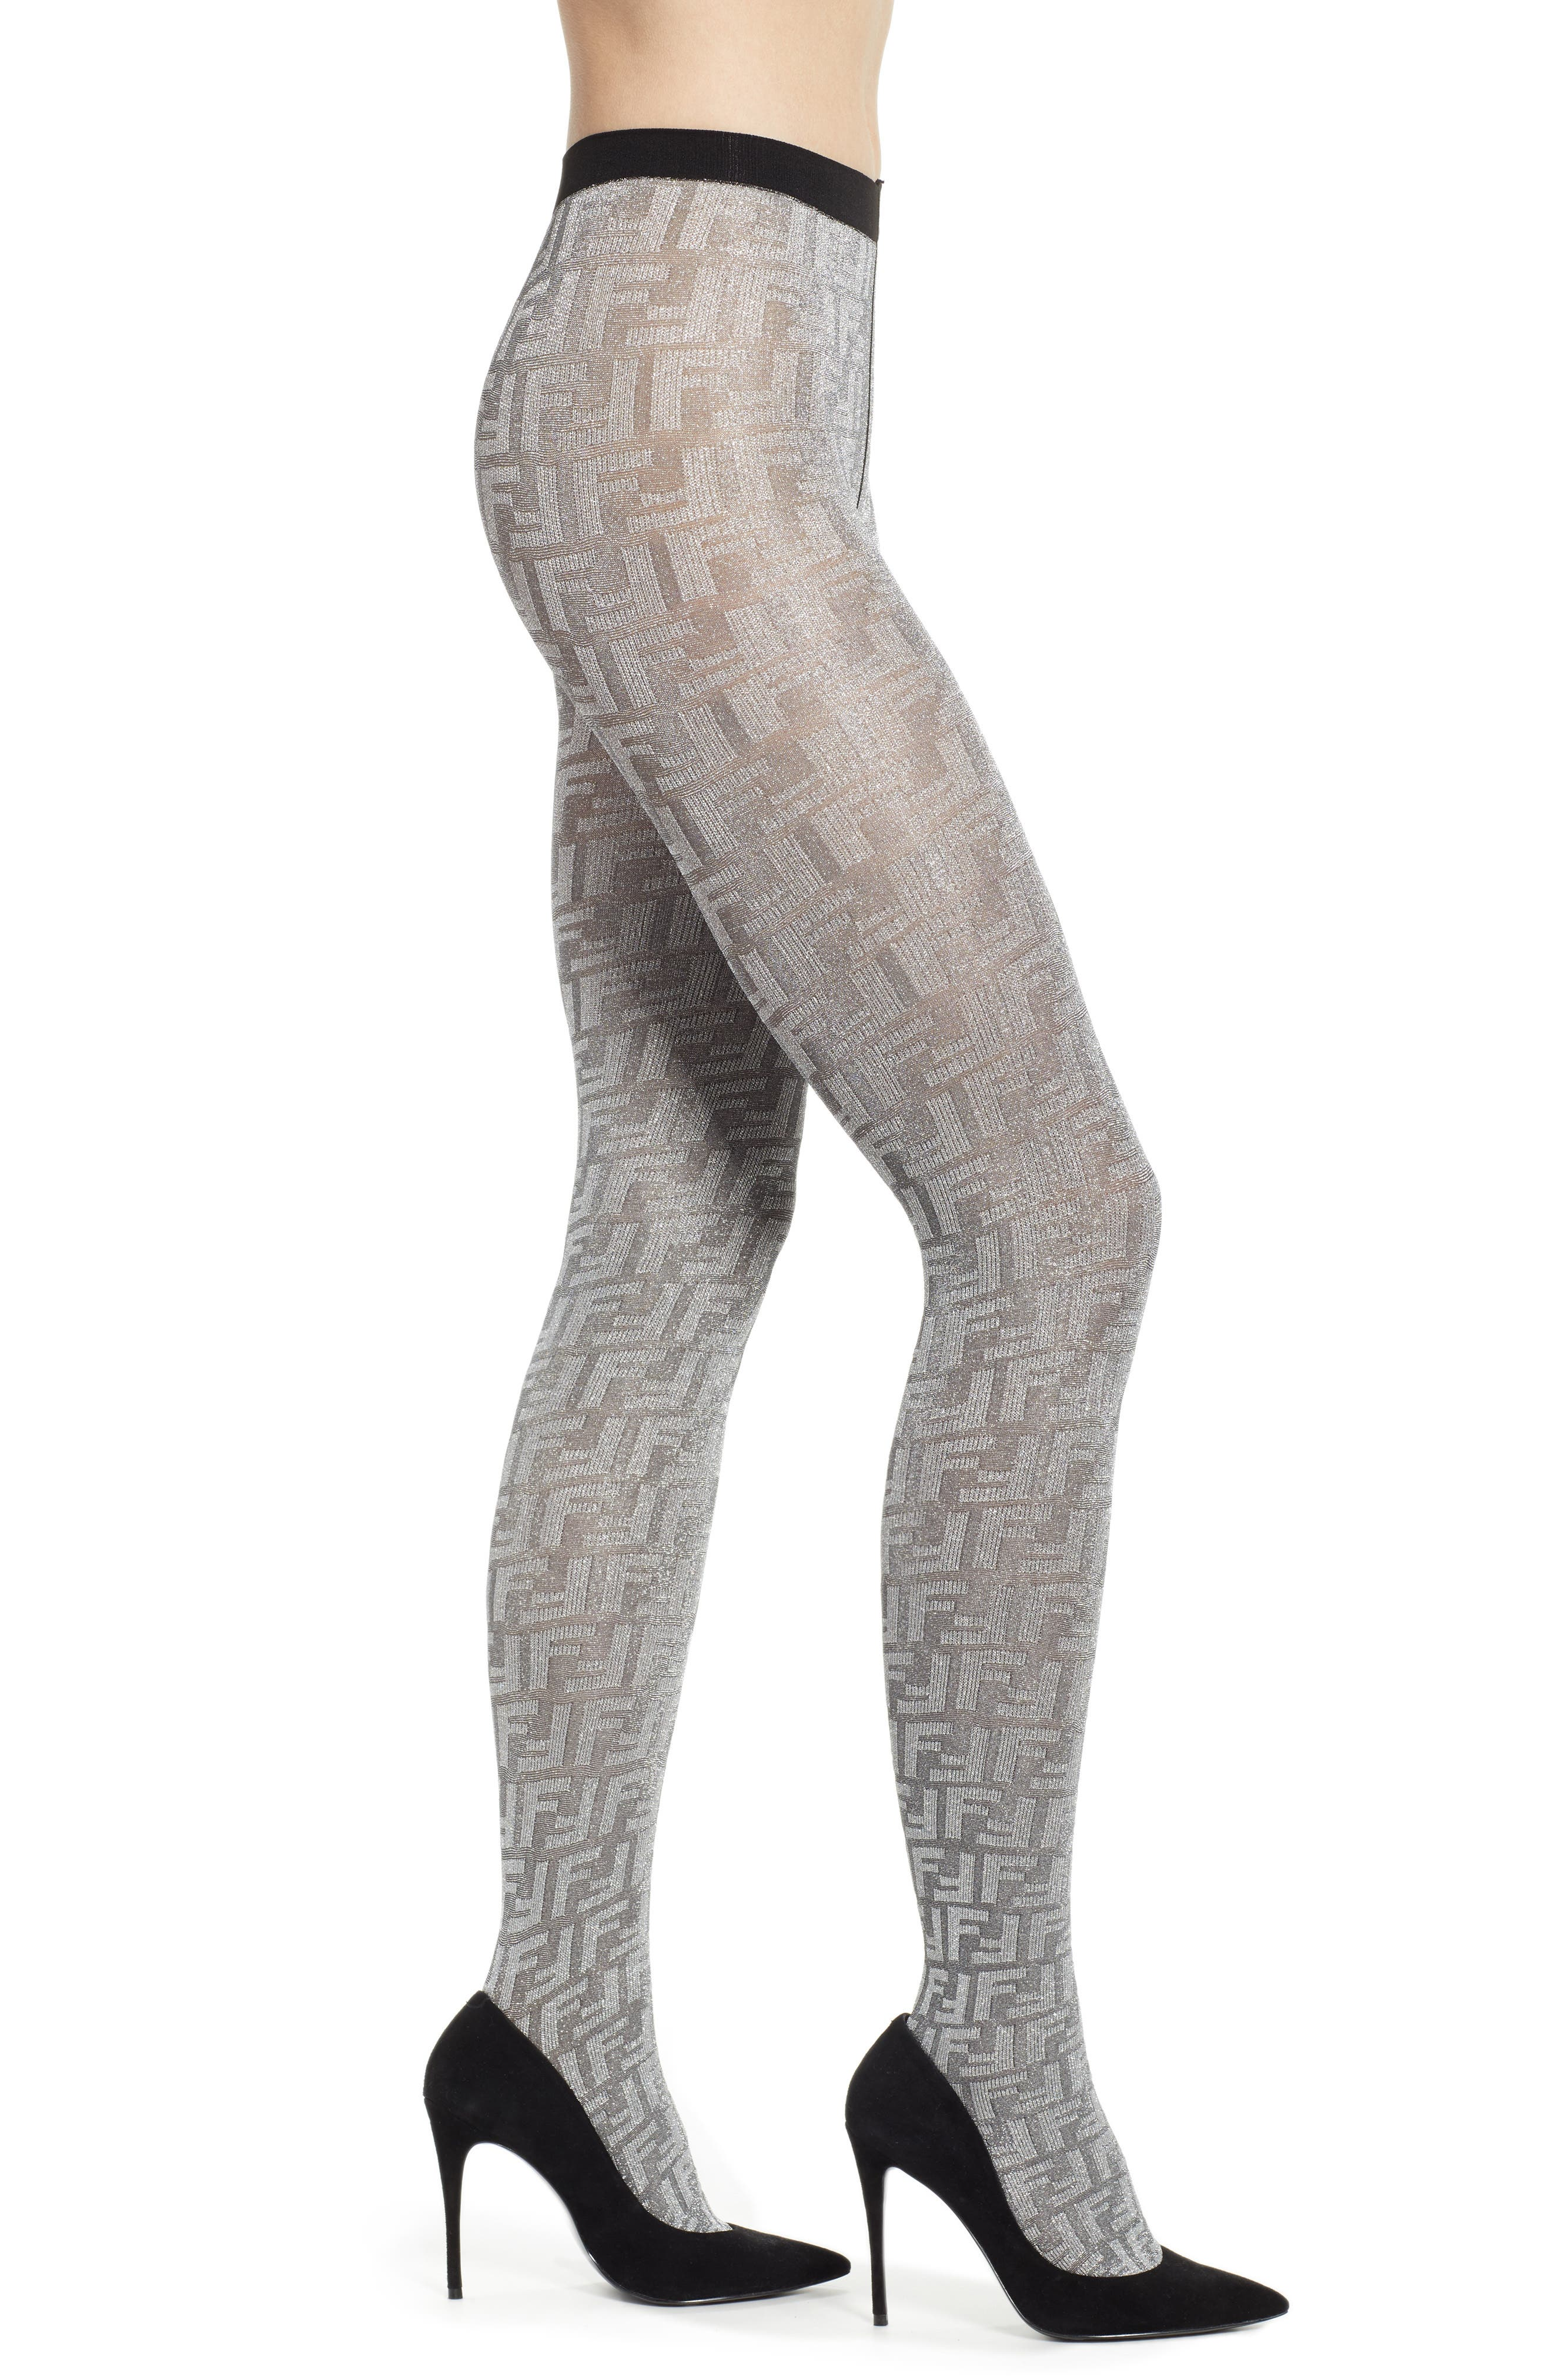 d00592f4b47 Women s Fendi Tights   Pantyhose